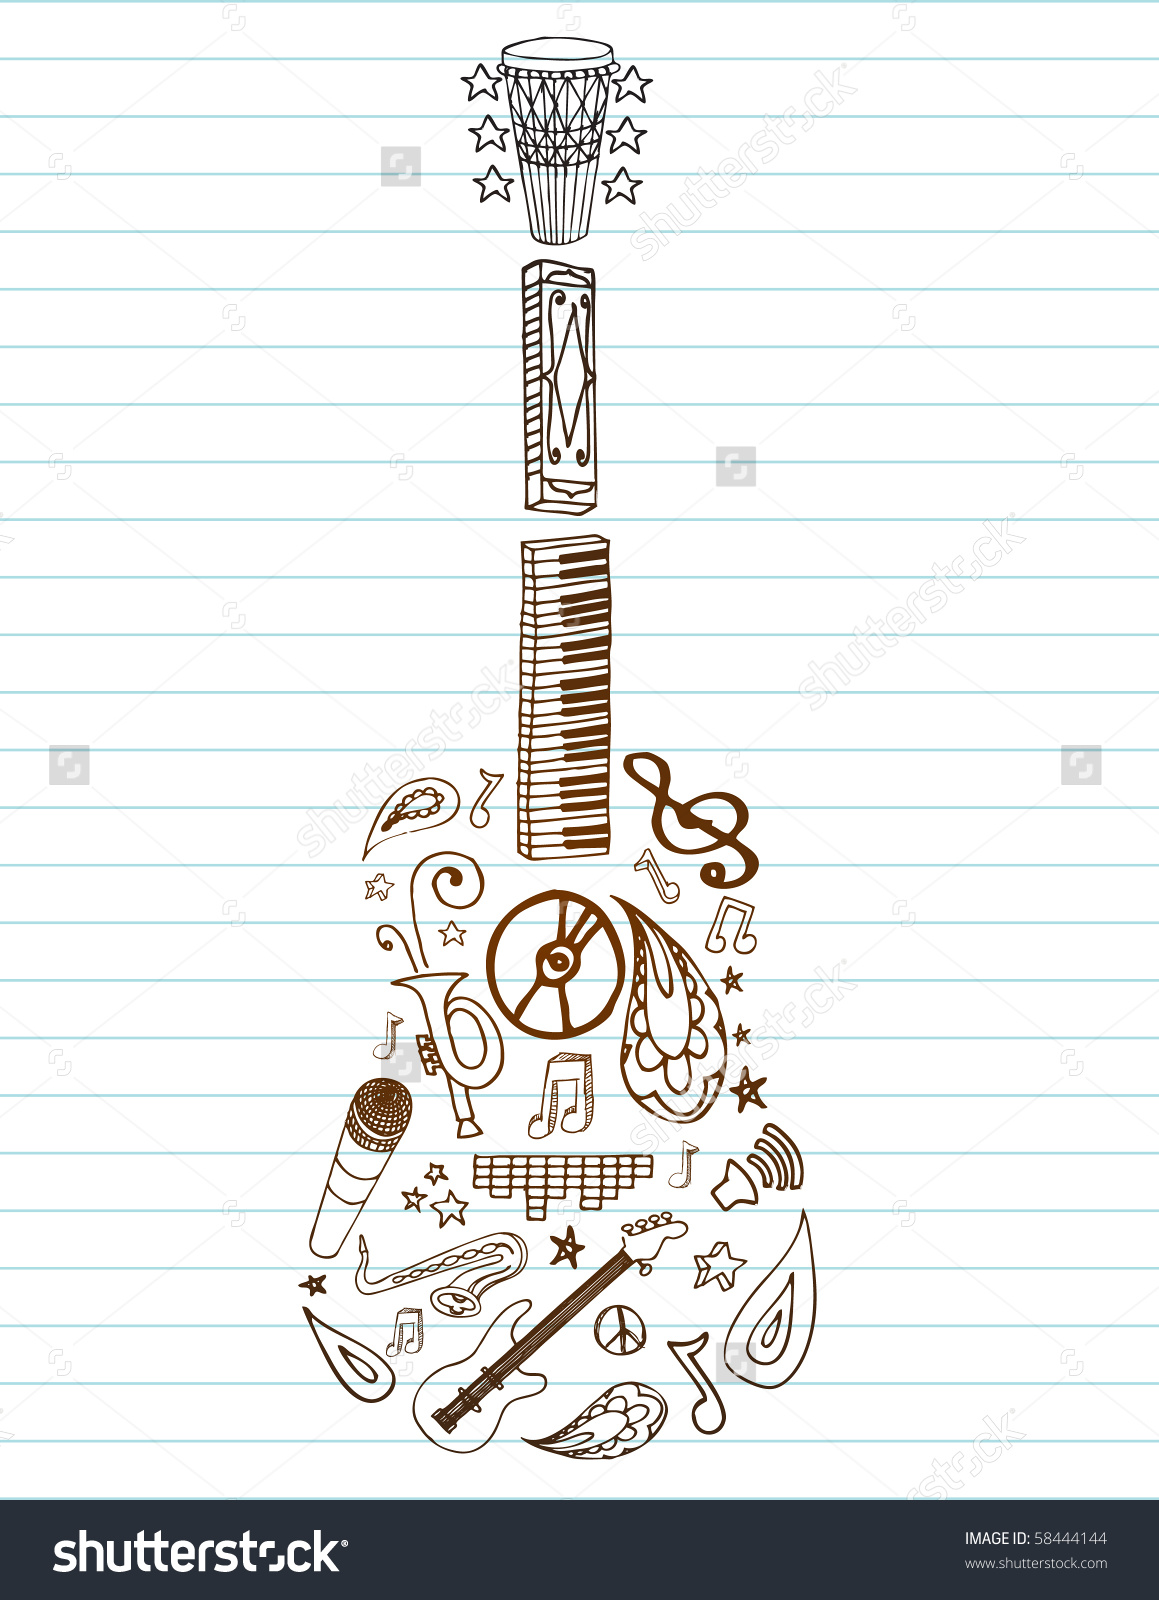 Selection Hand Drawn Music Doodles Make Stock Vector 58444144.